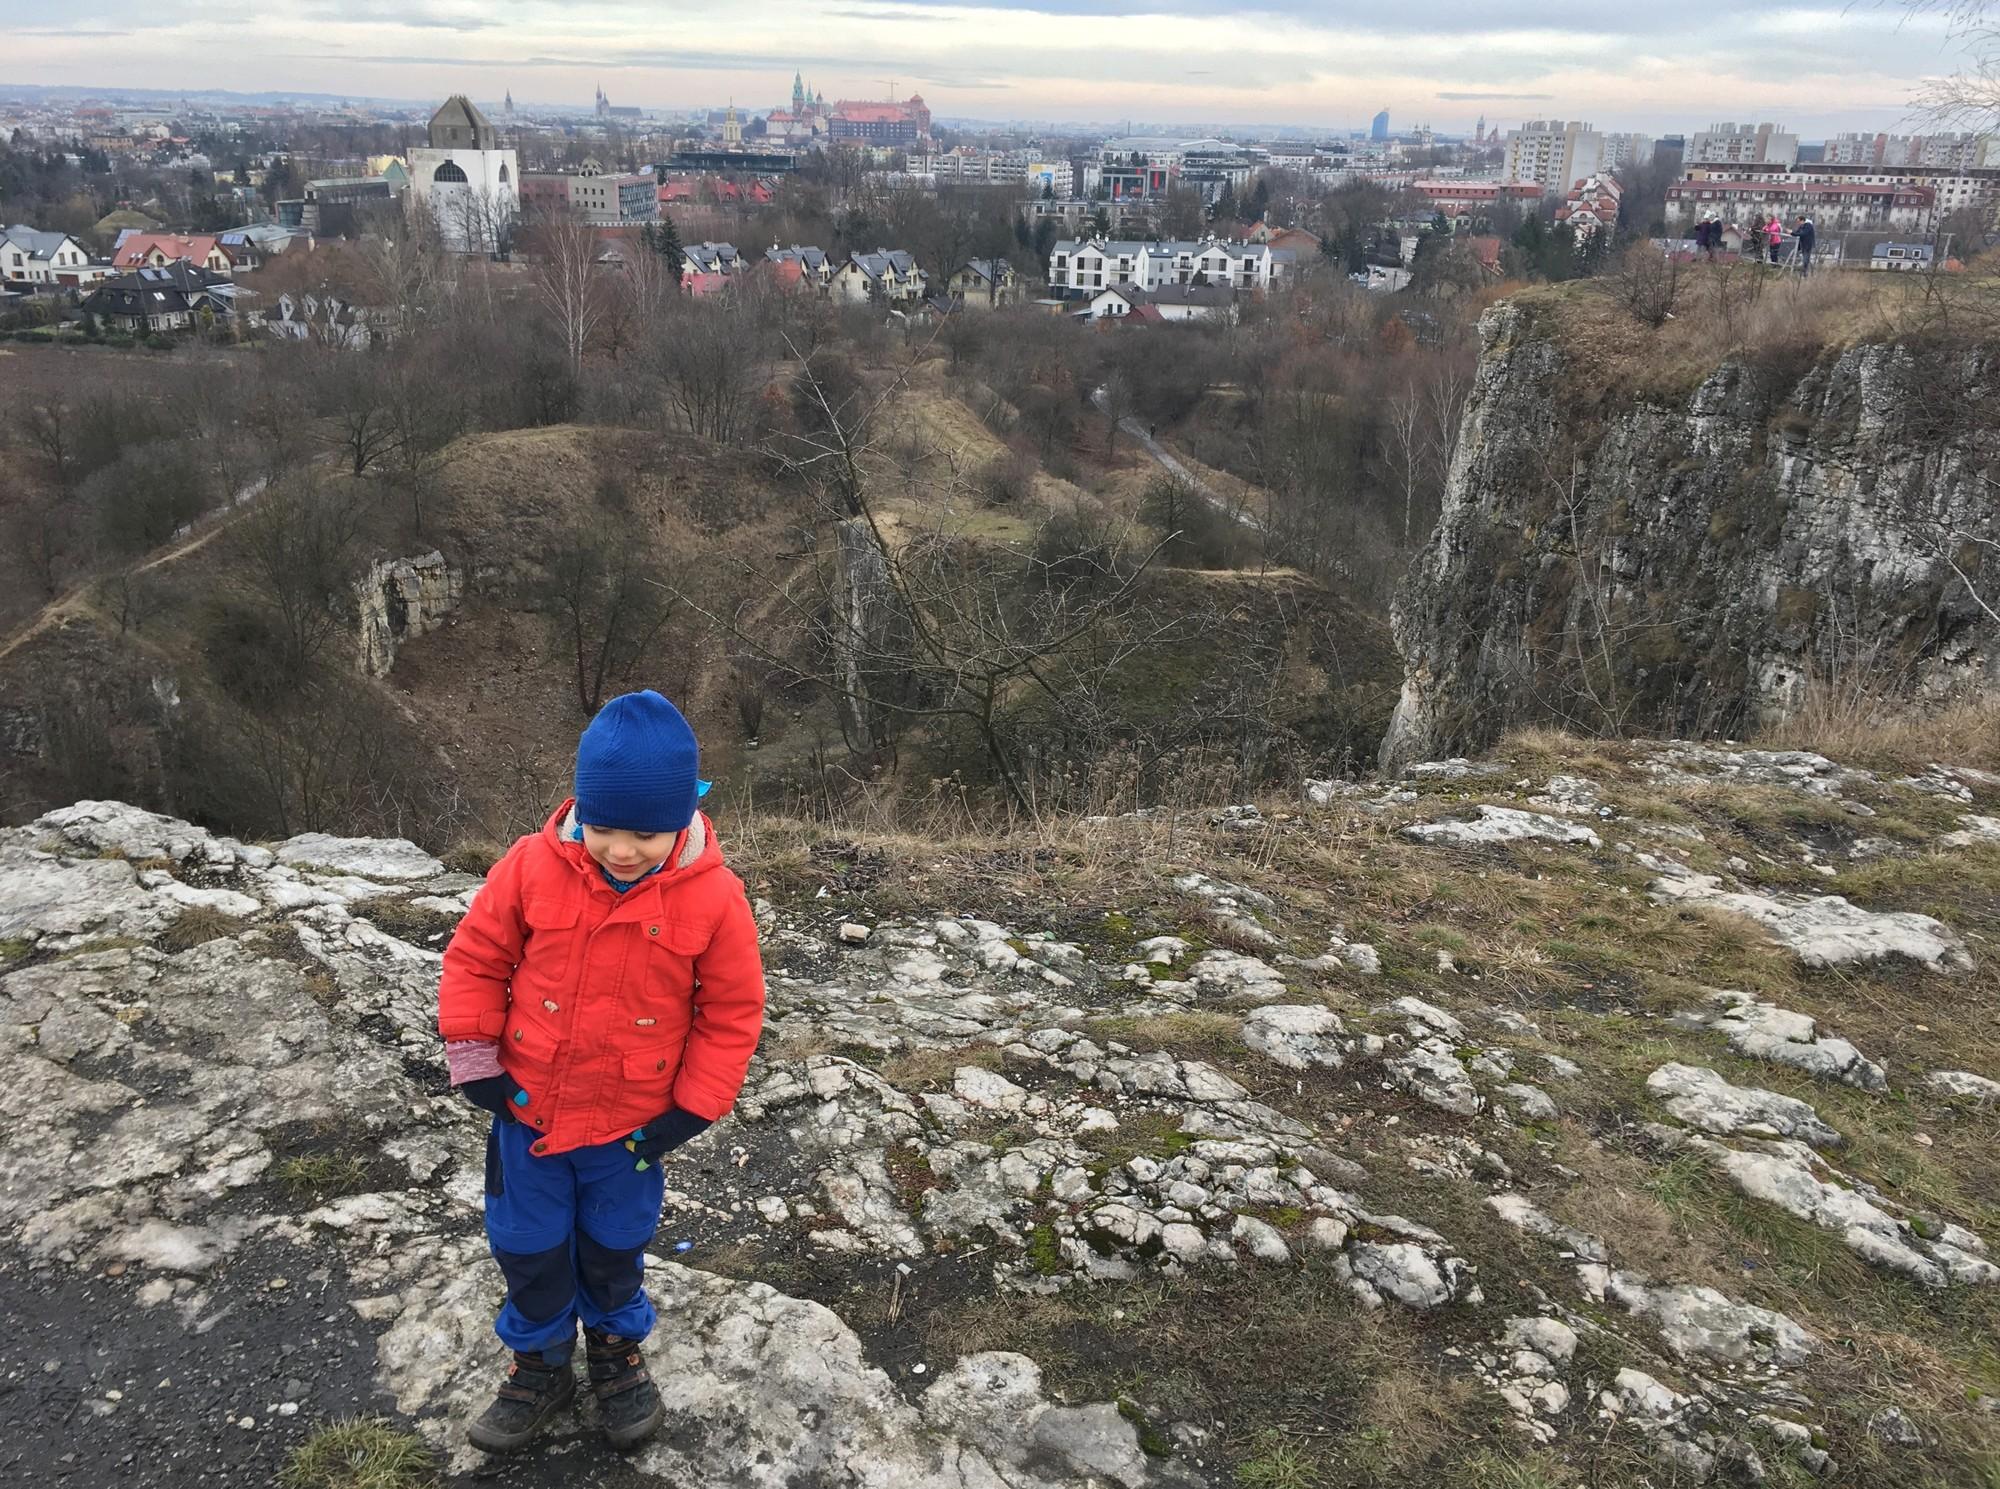 Zakrzówek Quarry | Activities & Leisure | Krakow